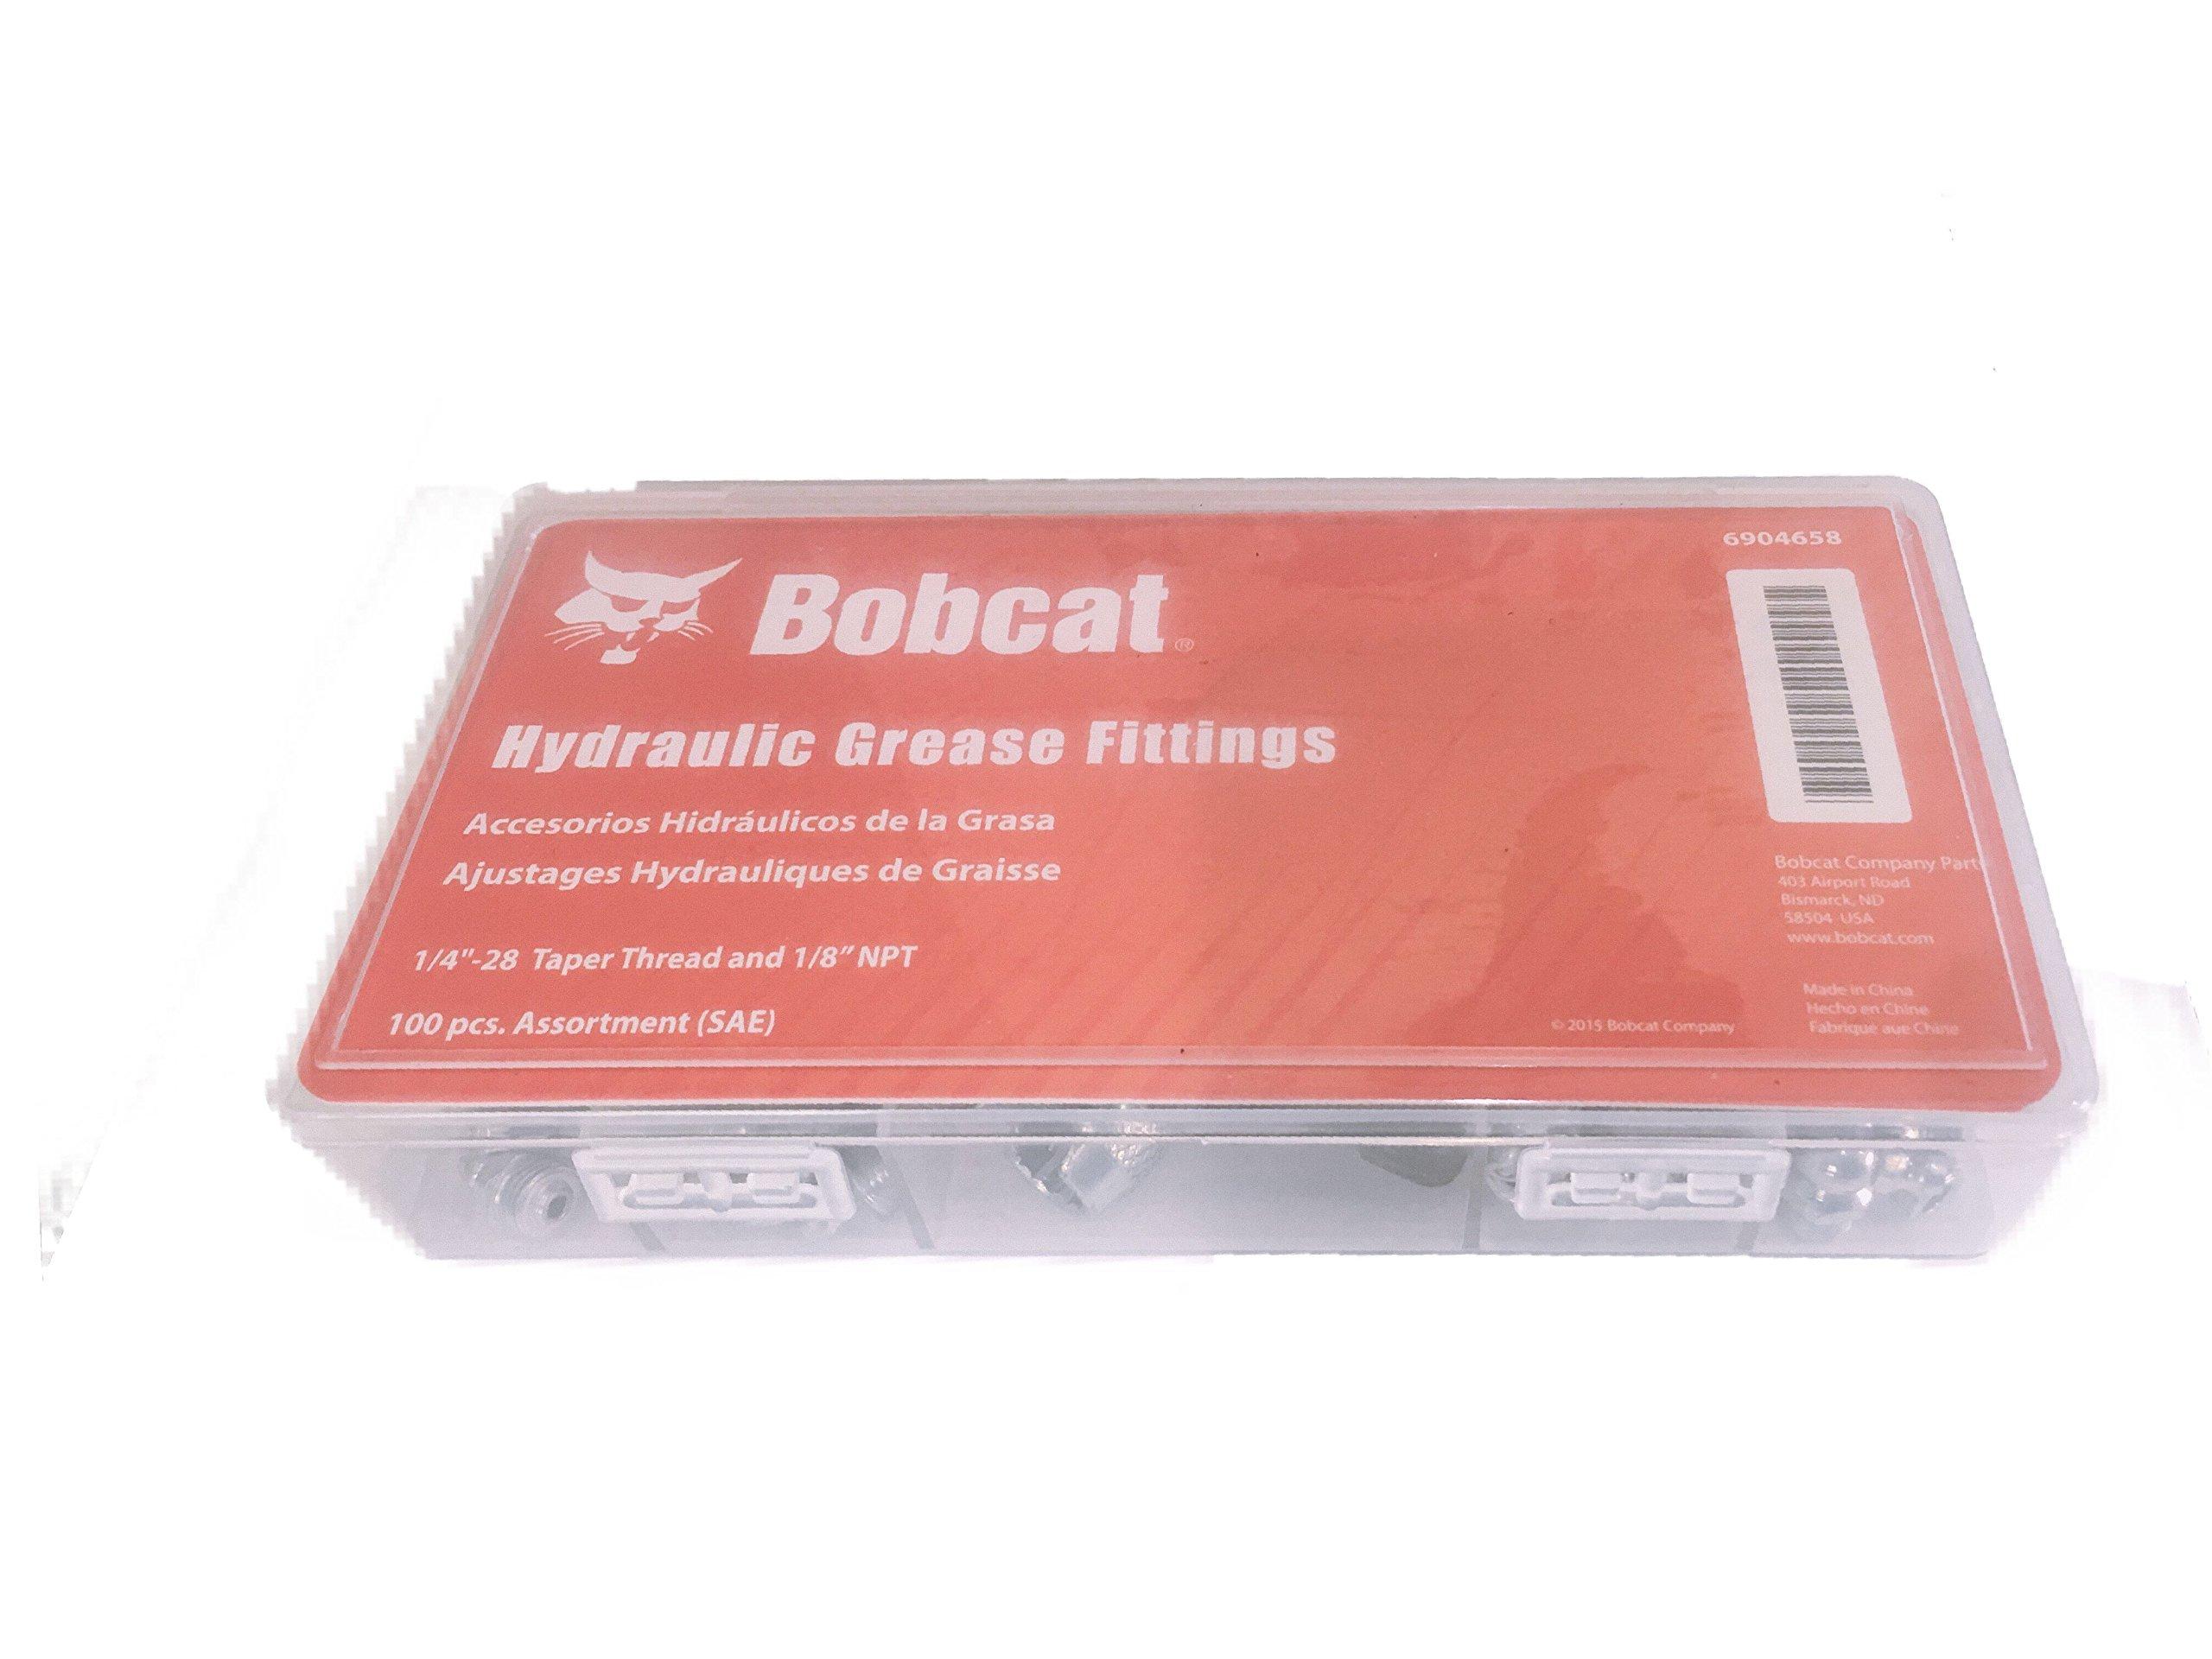 Bobcat ZERK Hydraulic Grease Fitting SAE Standard 100-Piece Kit – Straight, 90-Degree, 45-Degree Angled Assortment Set